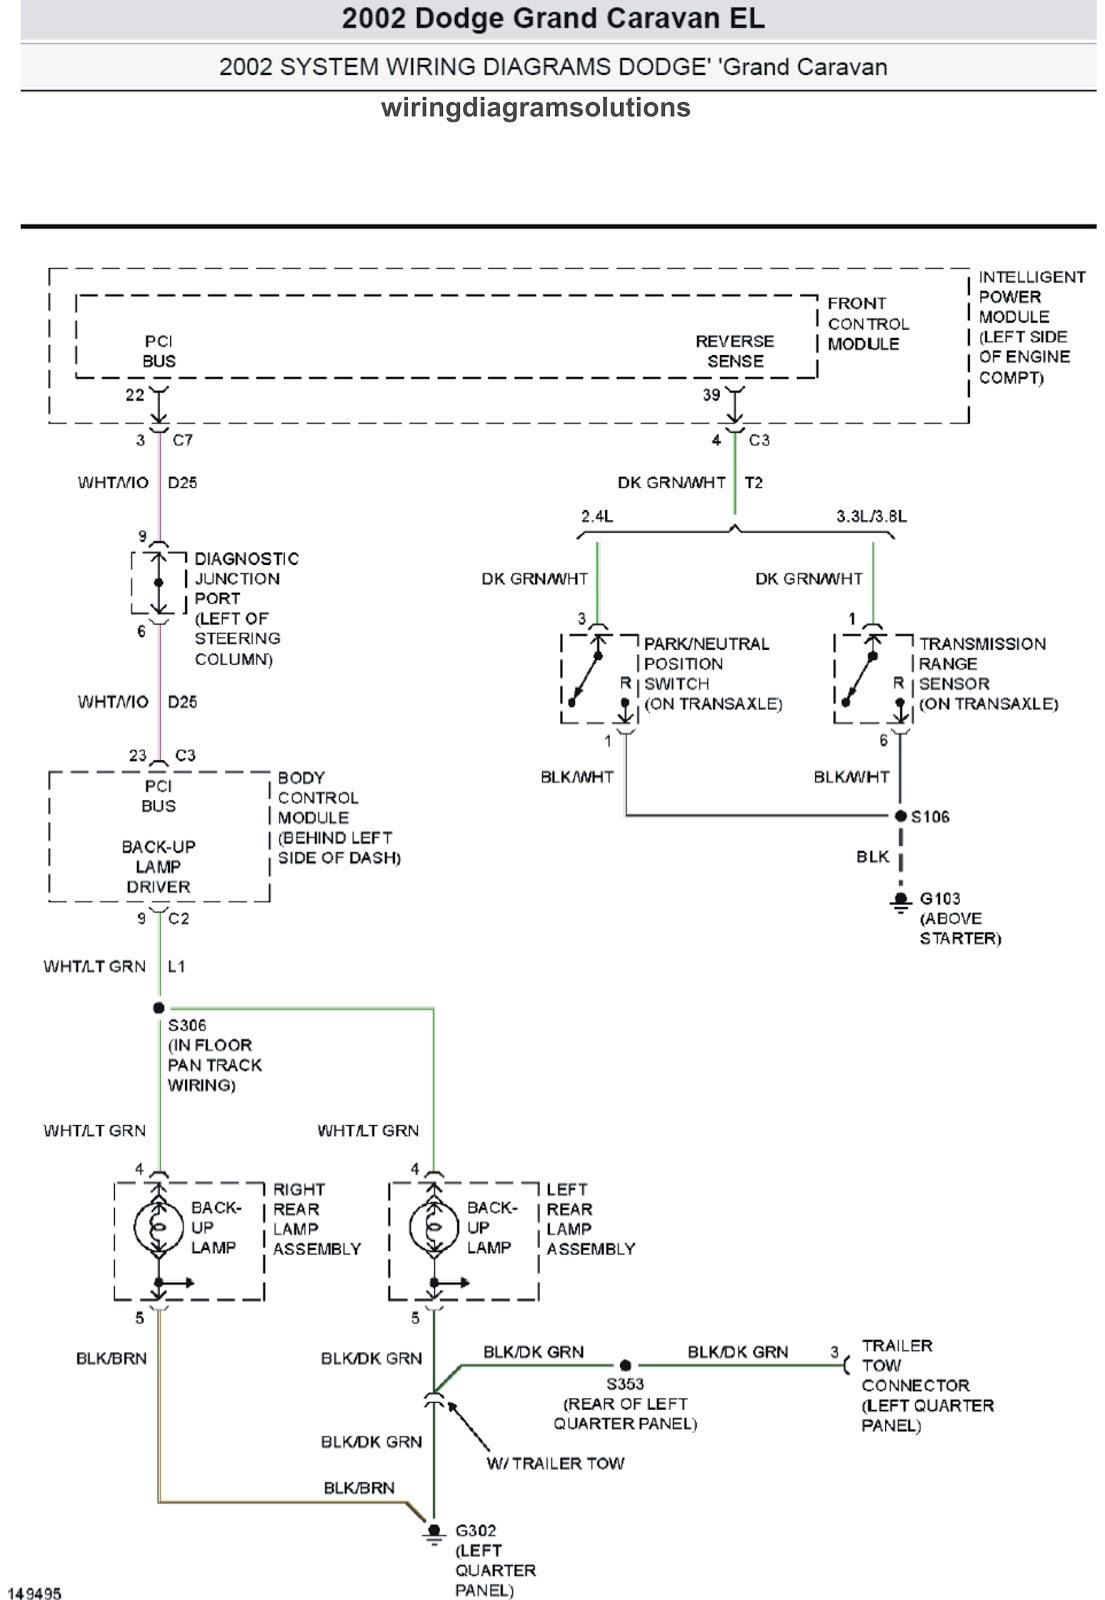 2002 Dodge Grand Caravan EL System Wiring Diagrams